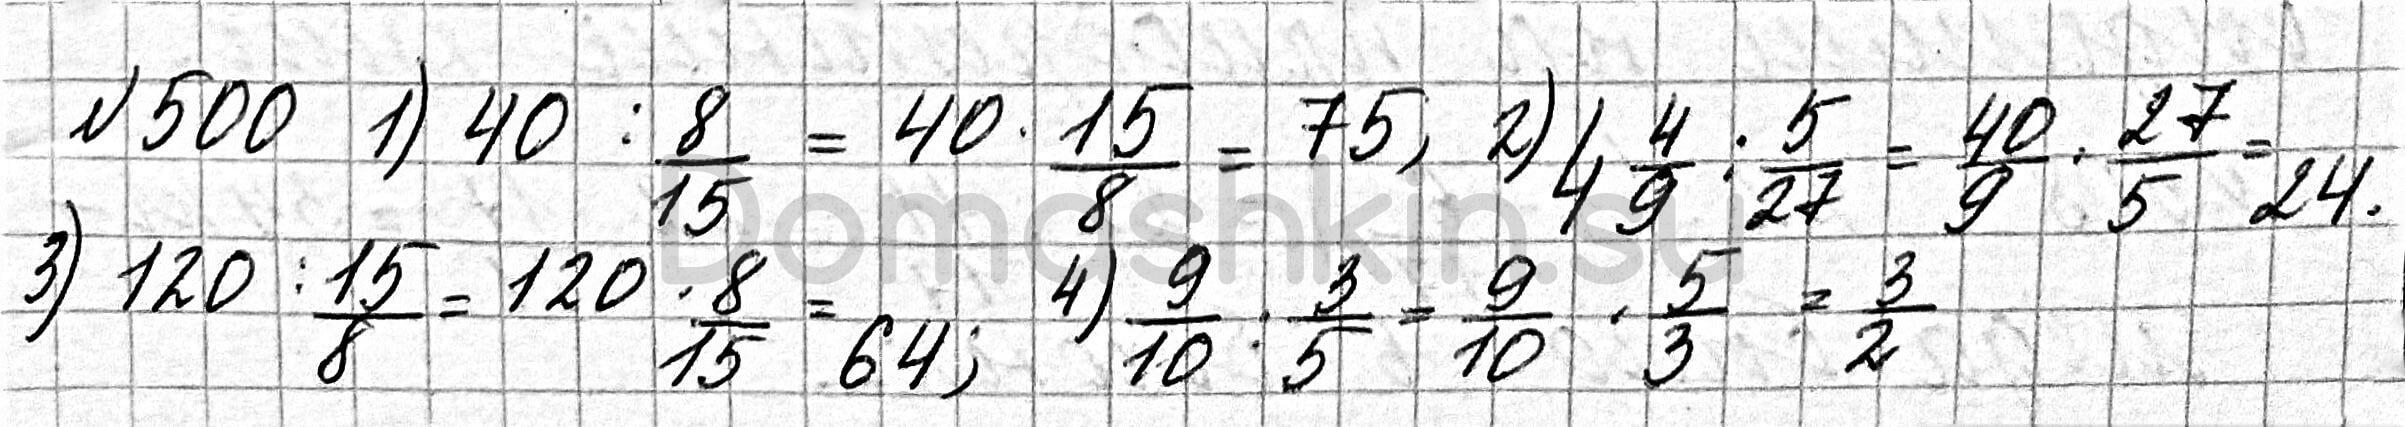 Математика 6 класс учебник Мерзляк номер 500 решение